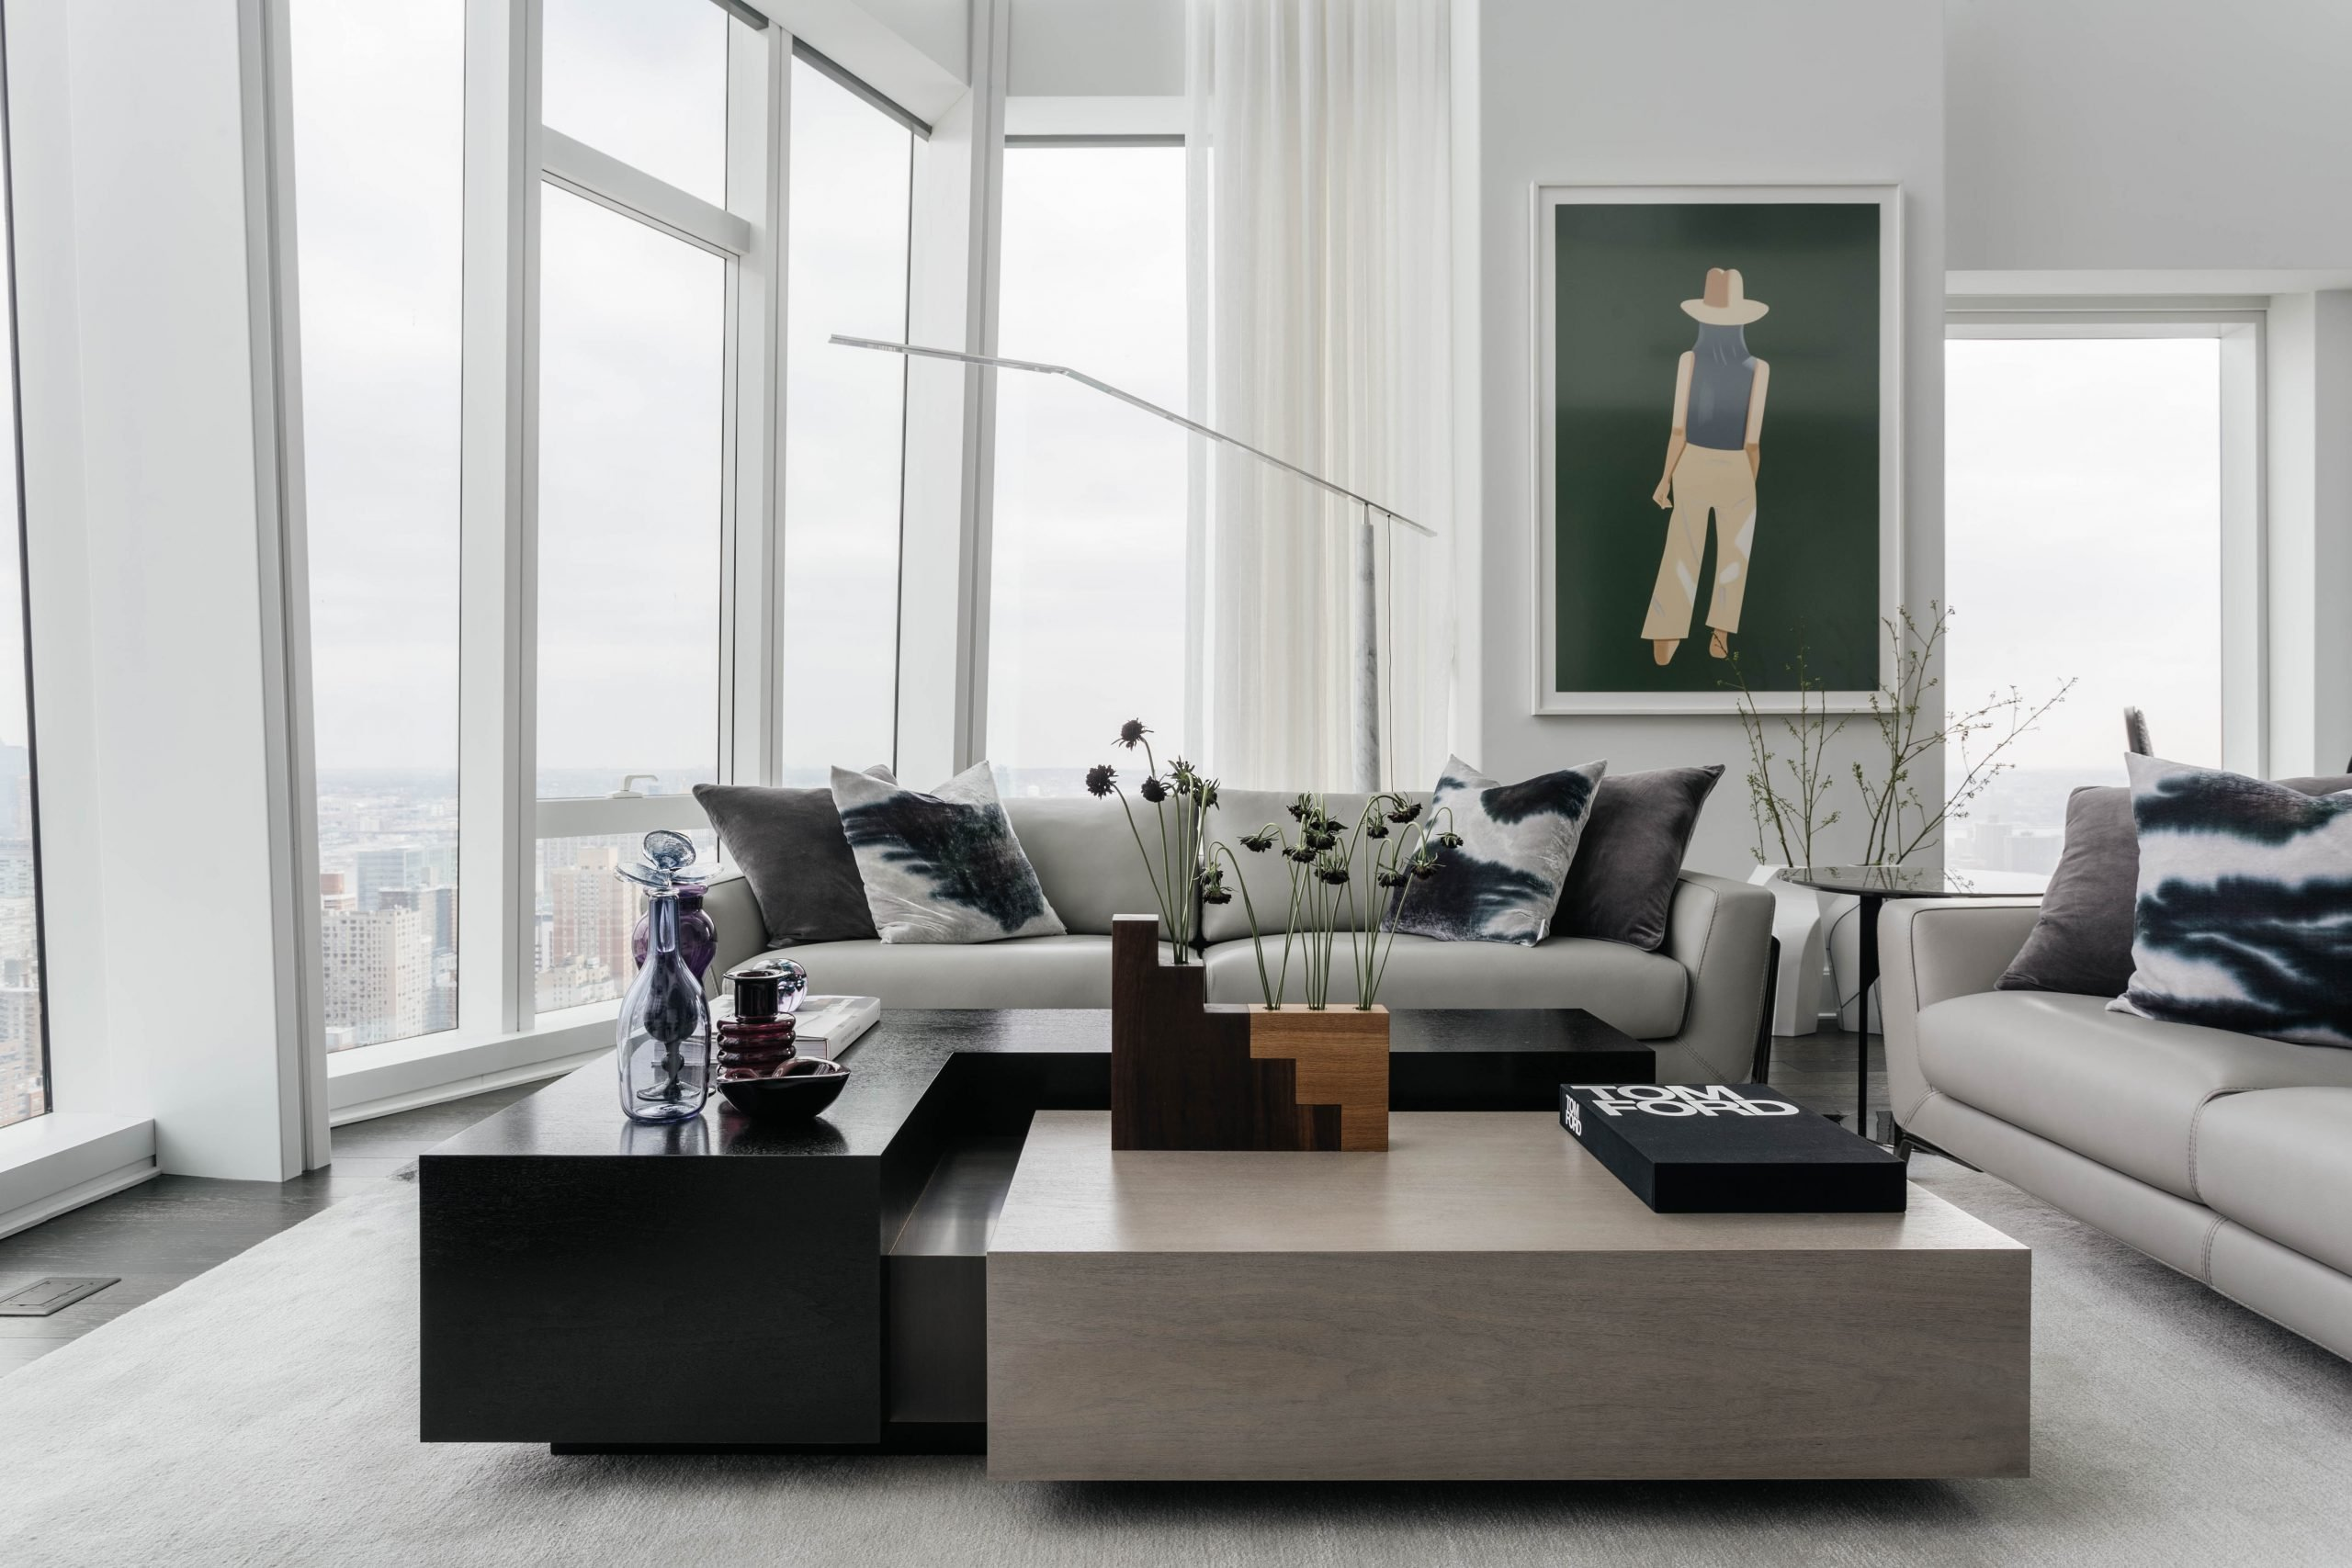 Madison Sq Tower - Art in Interior Design